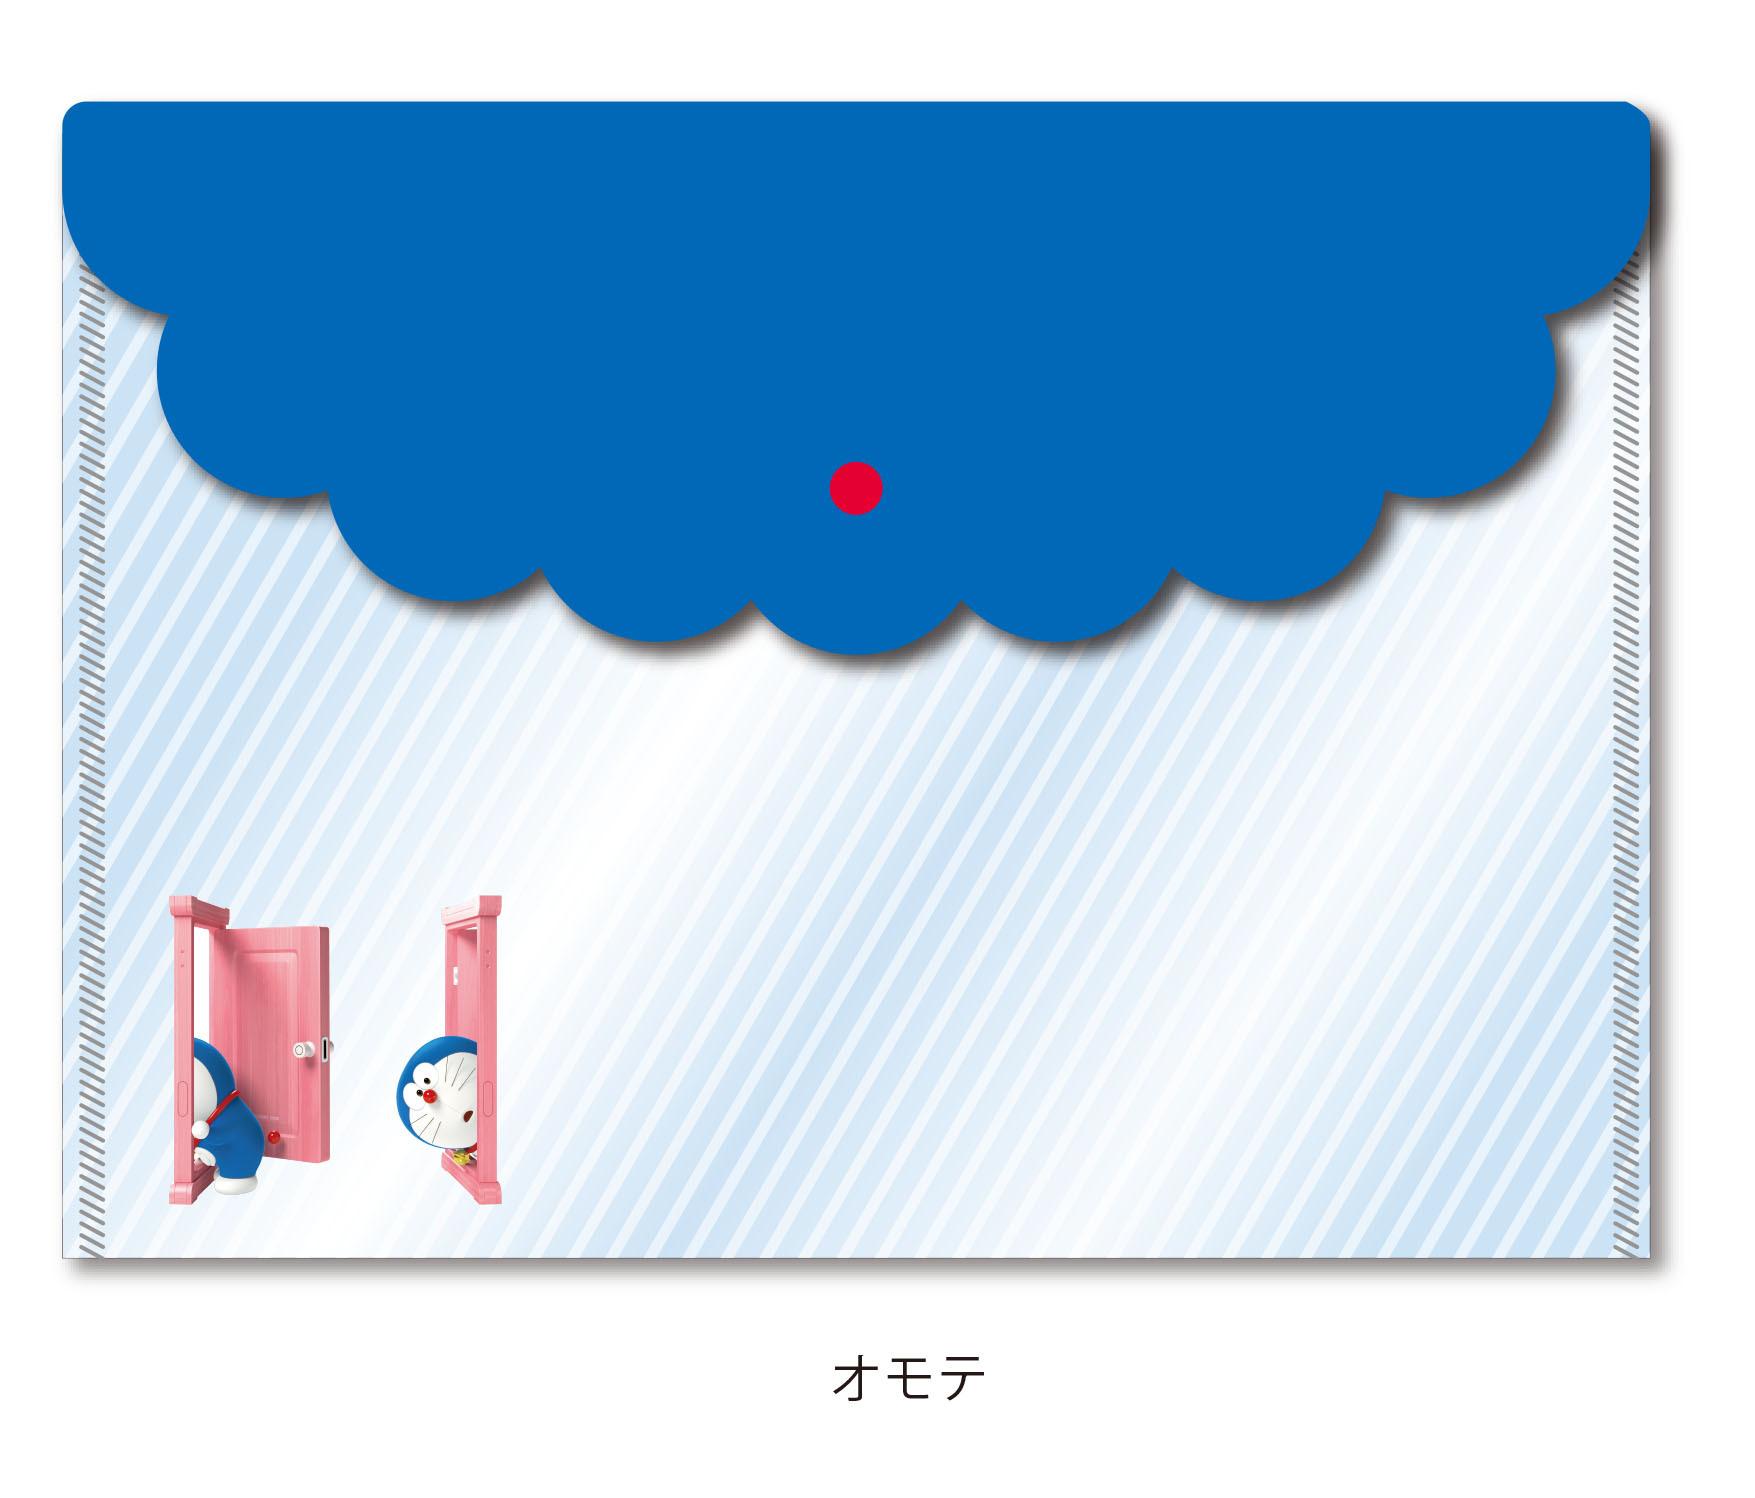 STAND BY ME ドラえもん 2 クリアケース  (フタつき)  /  エンスカイ